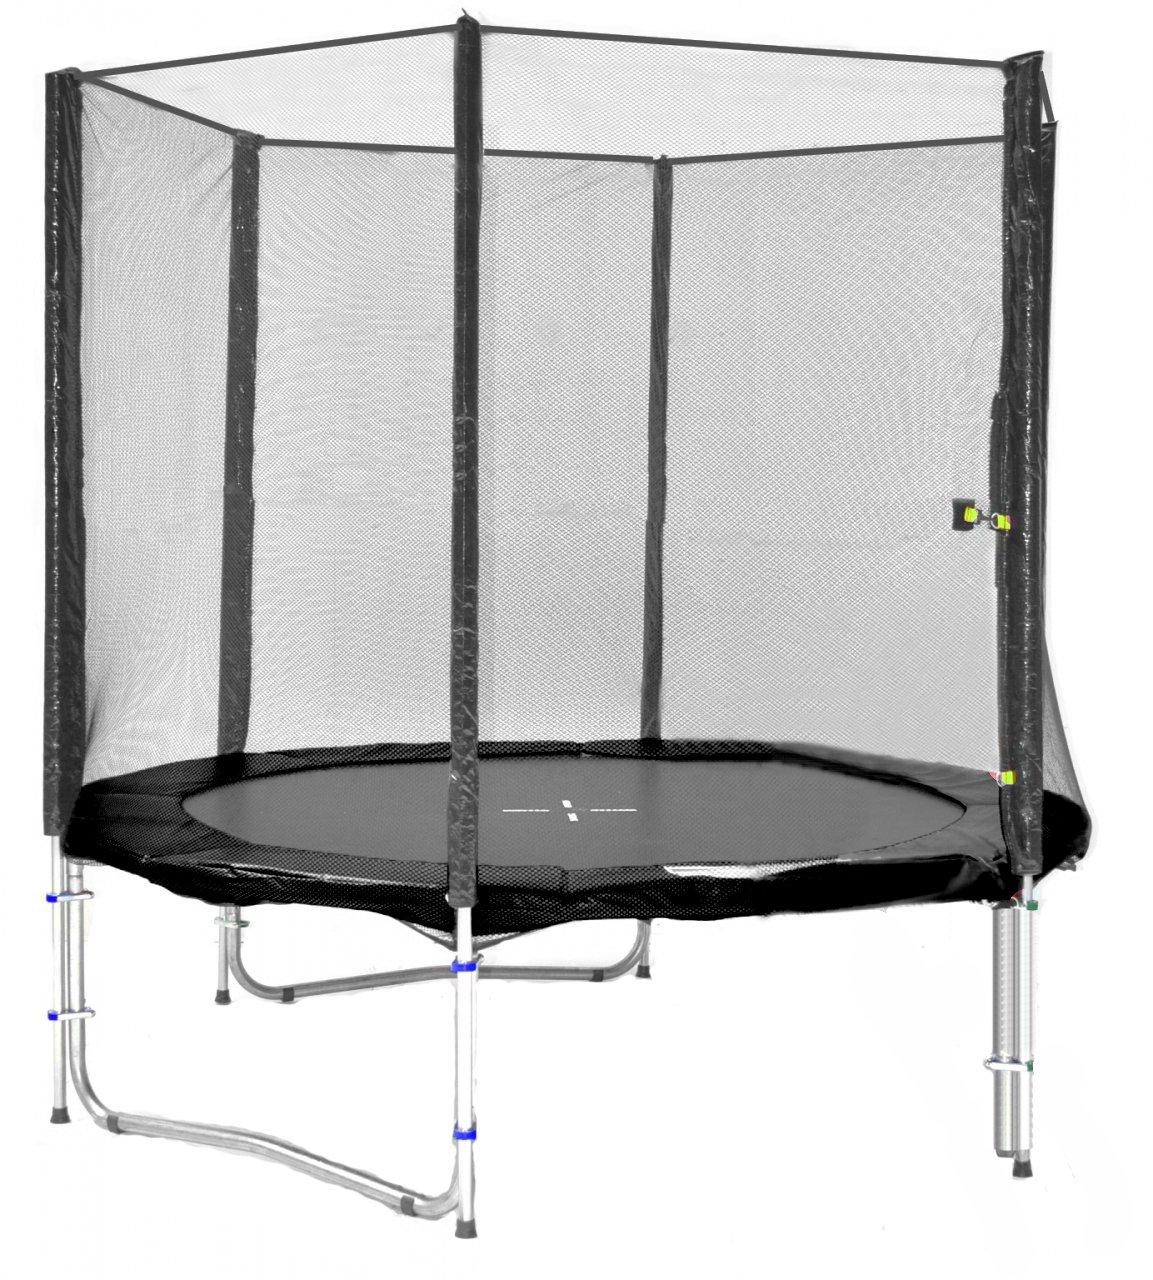 SB-185-S Gartentrampolin 185cm incl. Netz, 90kg Traglast kaufen